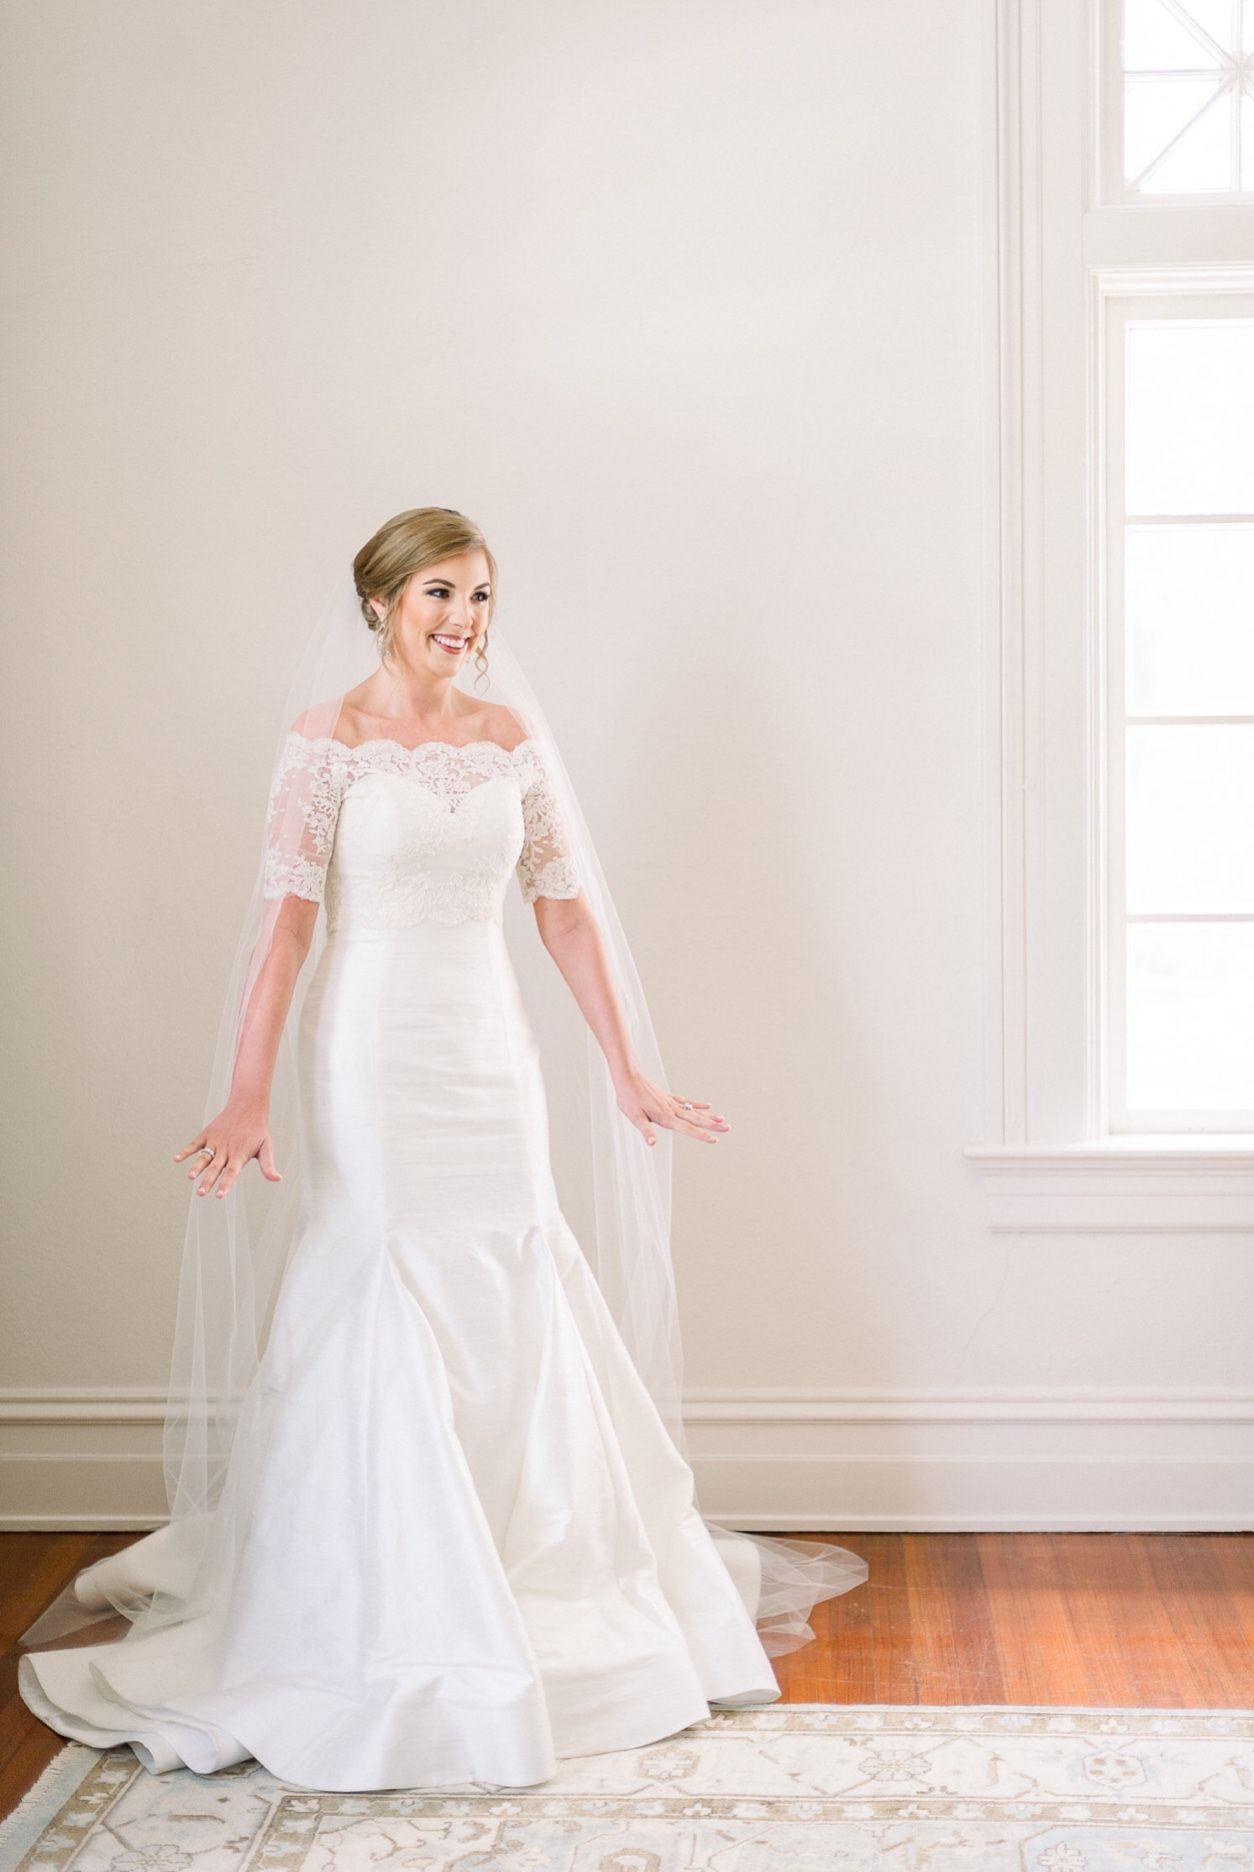 The615bride Build A Bride Wedding Dresses In Nashville Tn Nashville Bridal Fashion See More W Ruffle Wedding Dress Casual Wedding Dress Wedding Dresses [ 1872 x 1254 Pixel ]